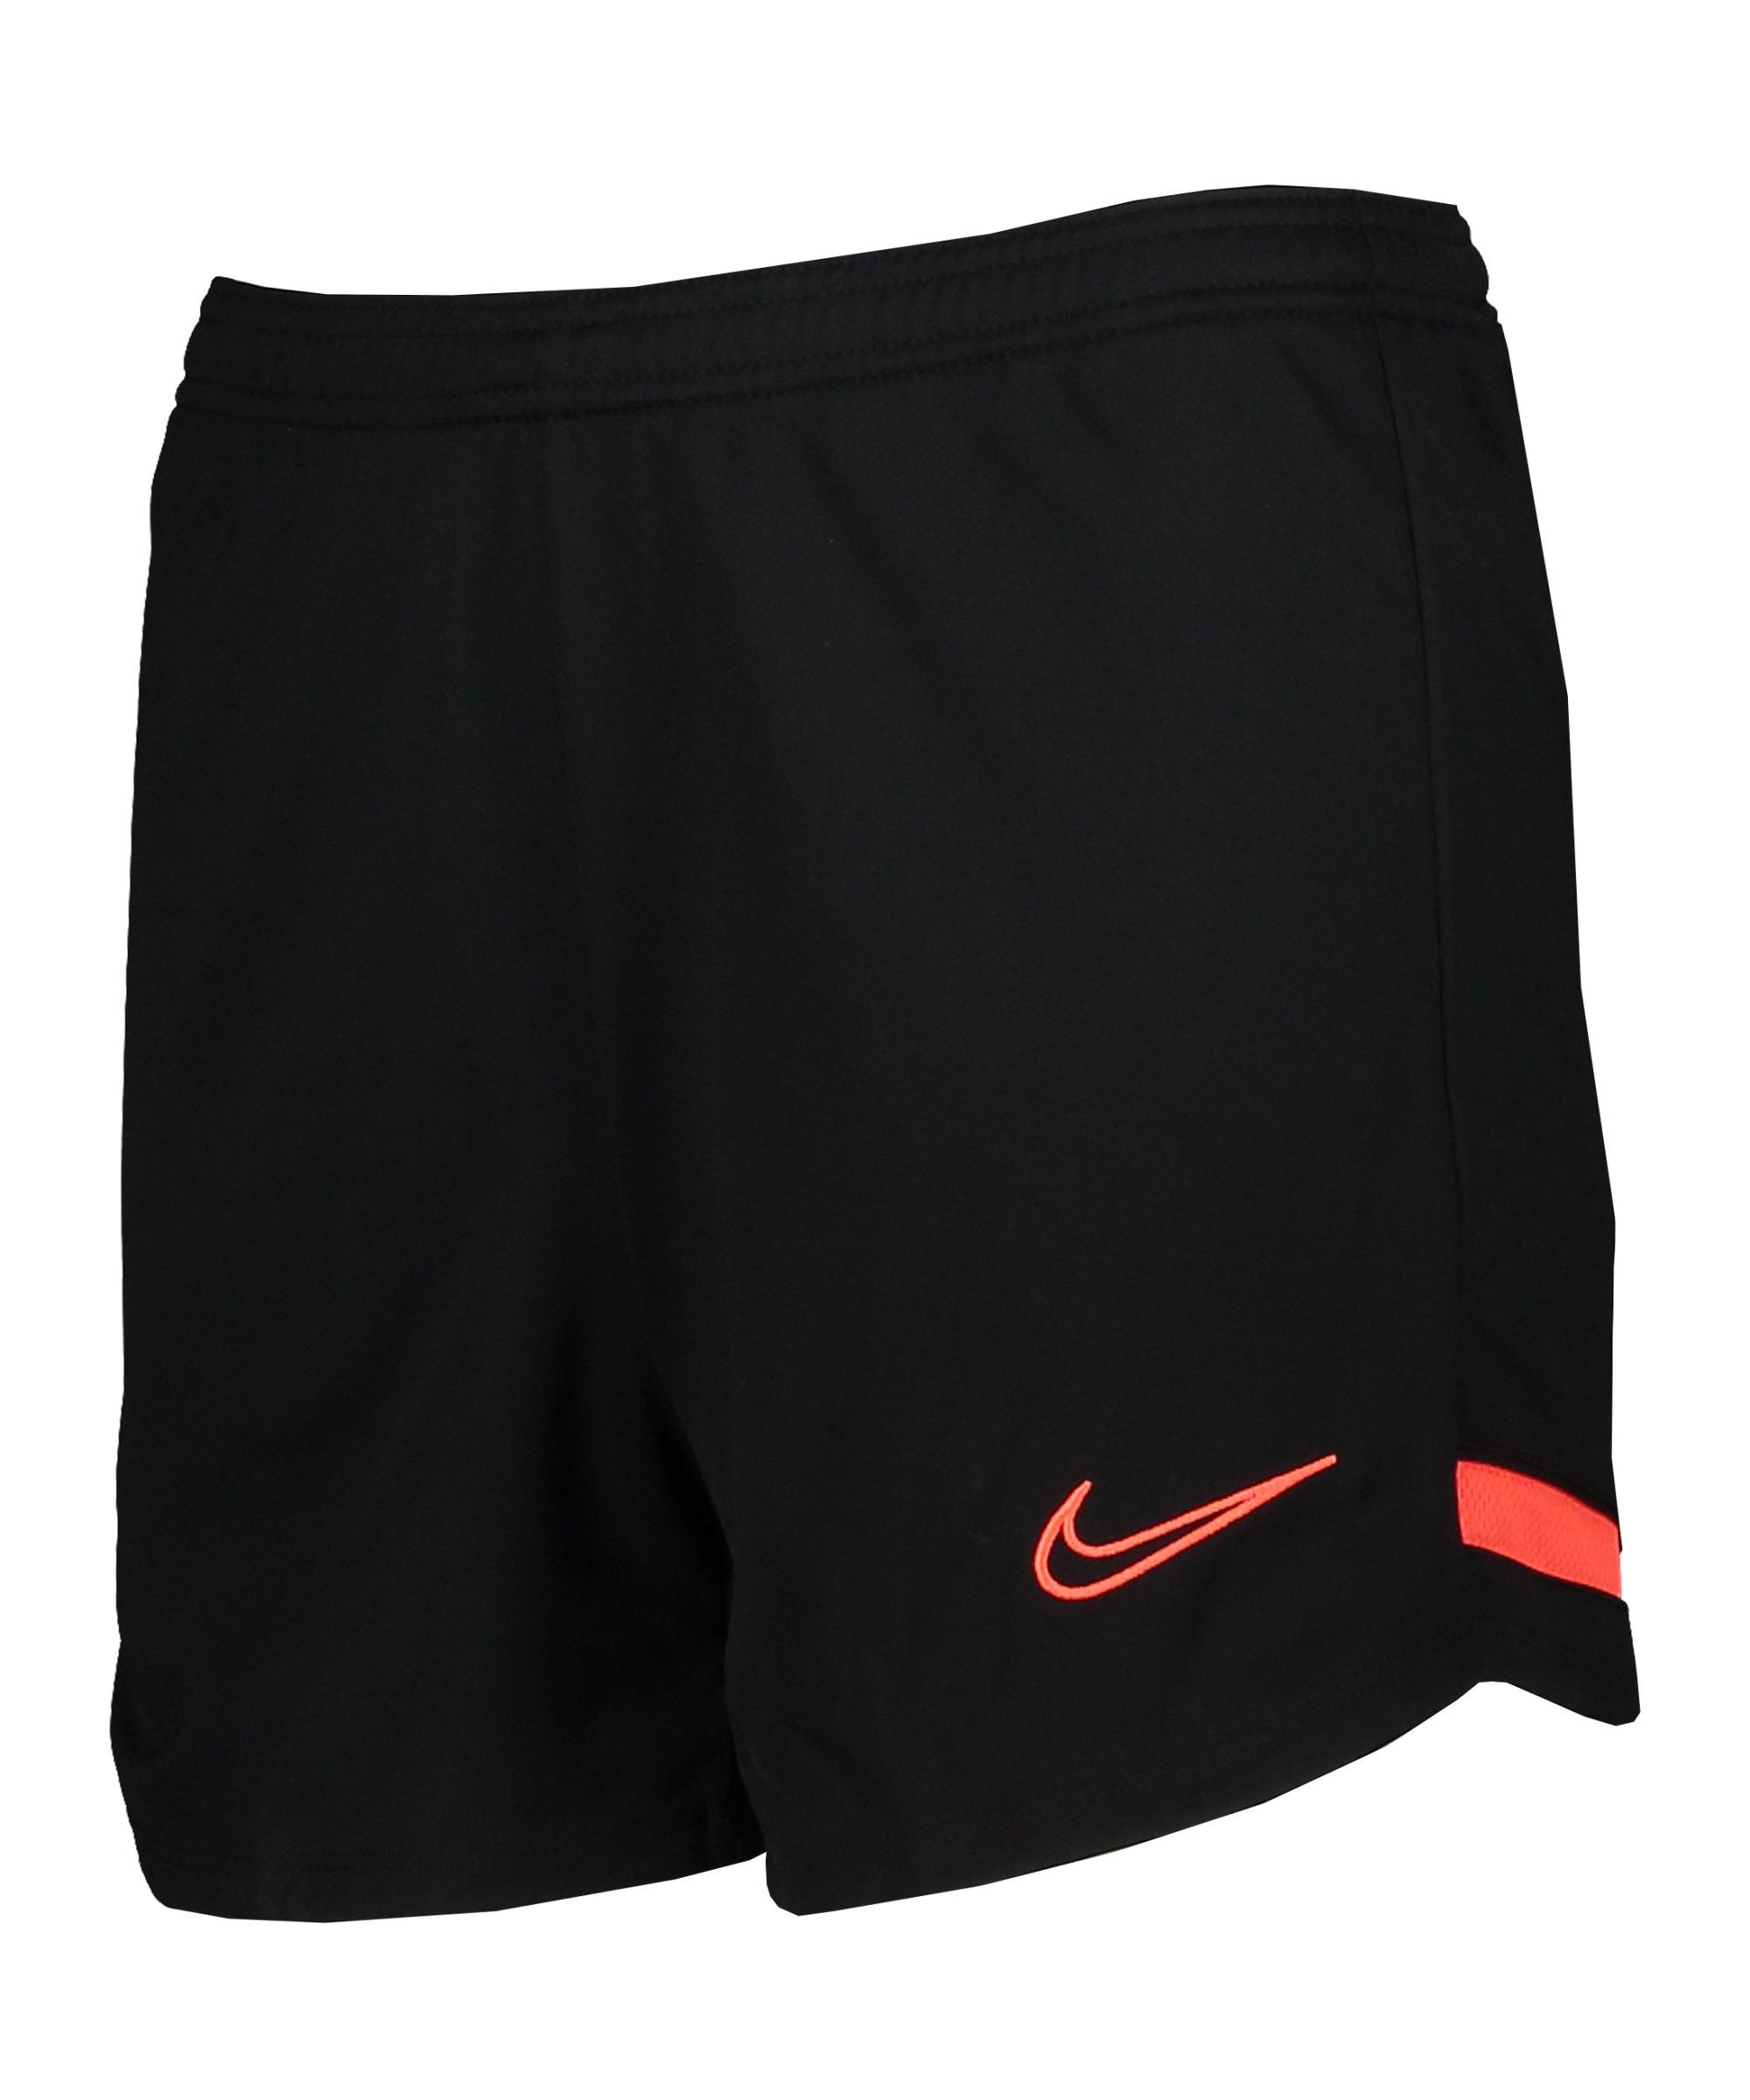 Nike Academy 21 Short Damen Schwarz F016 - schwarz